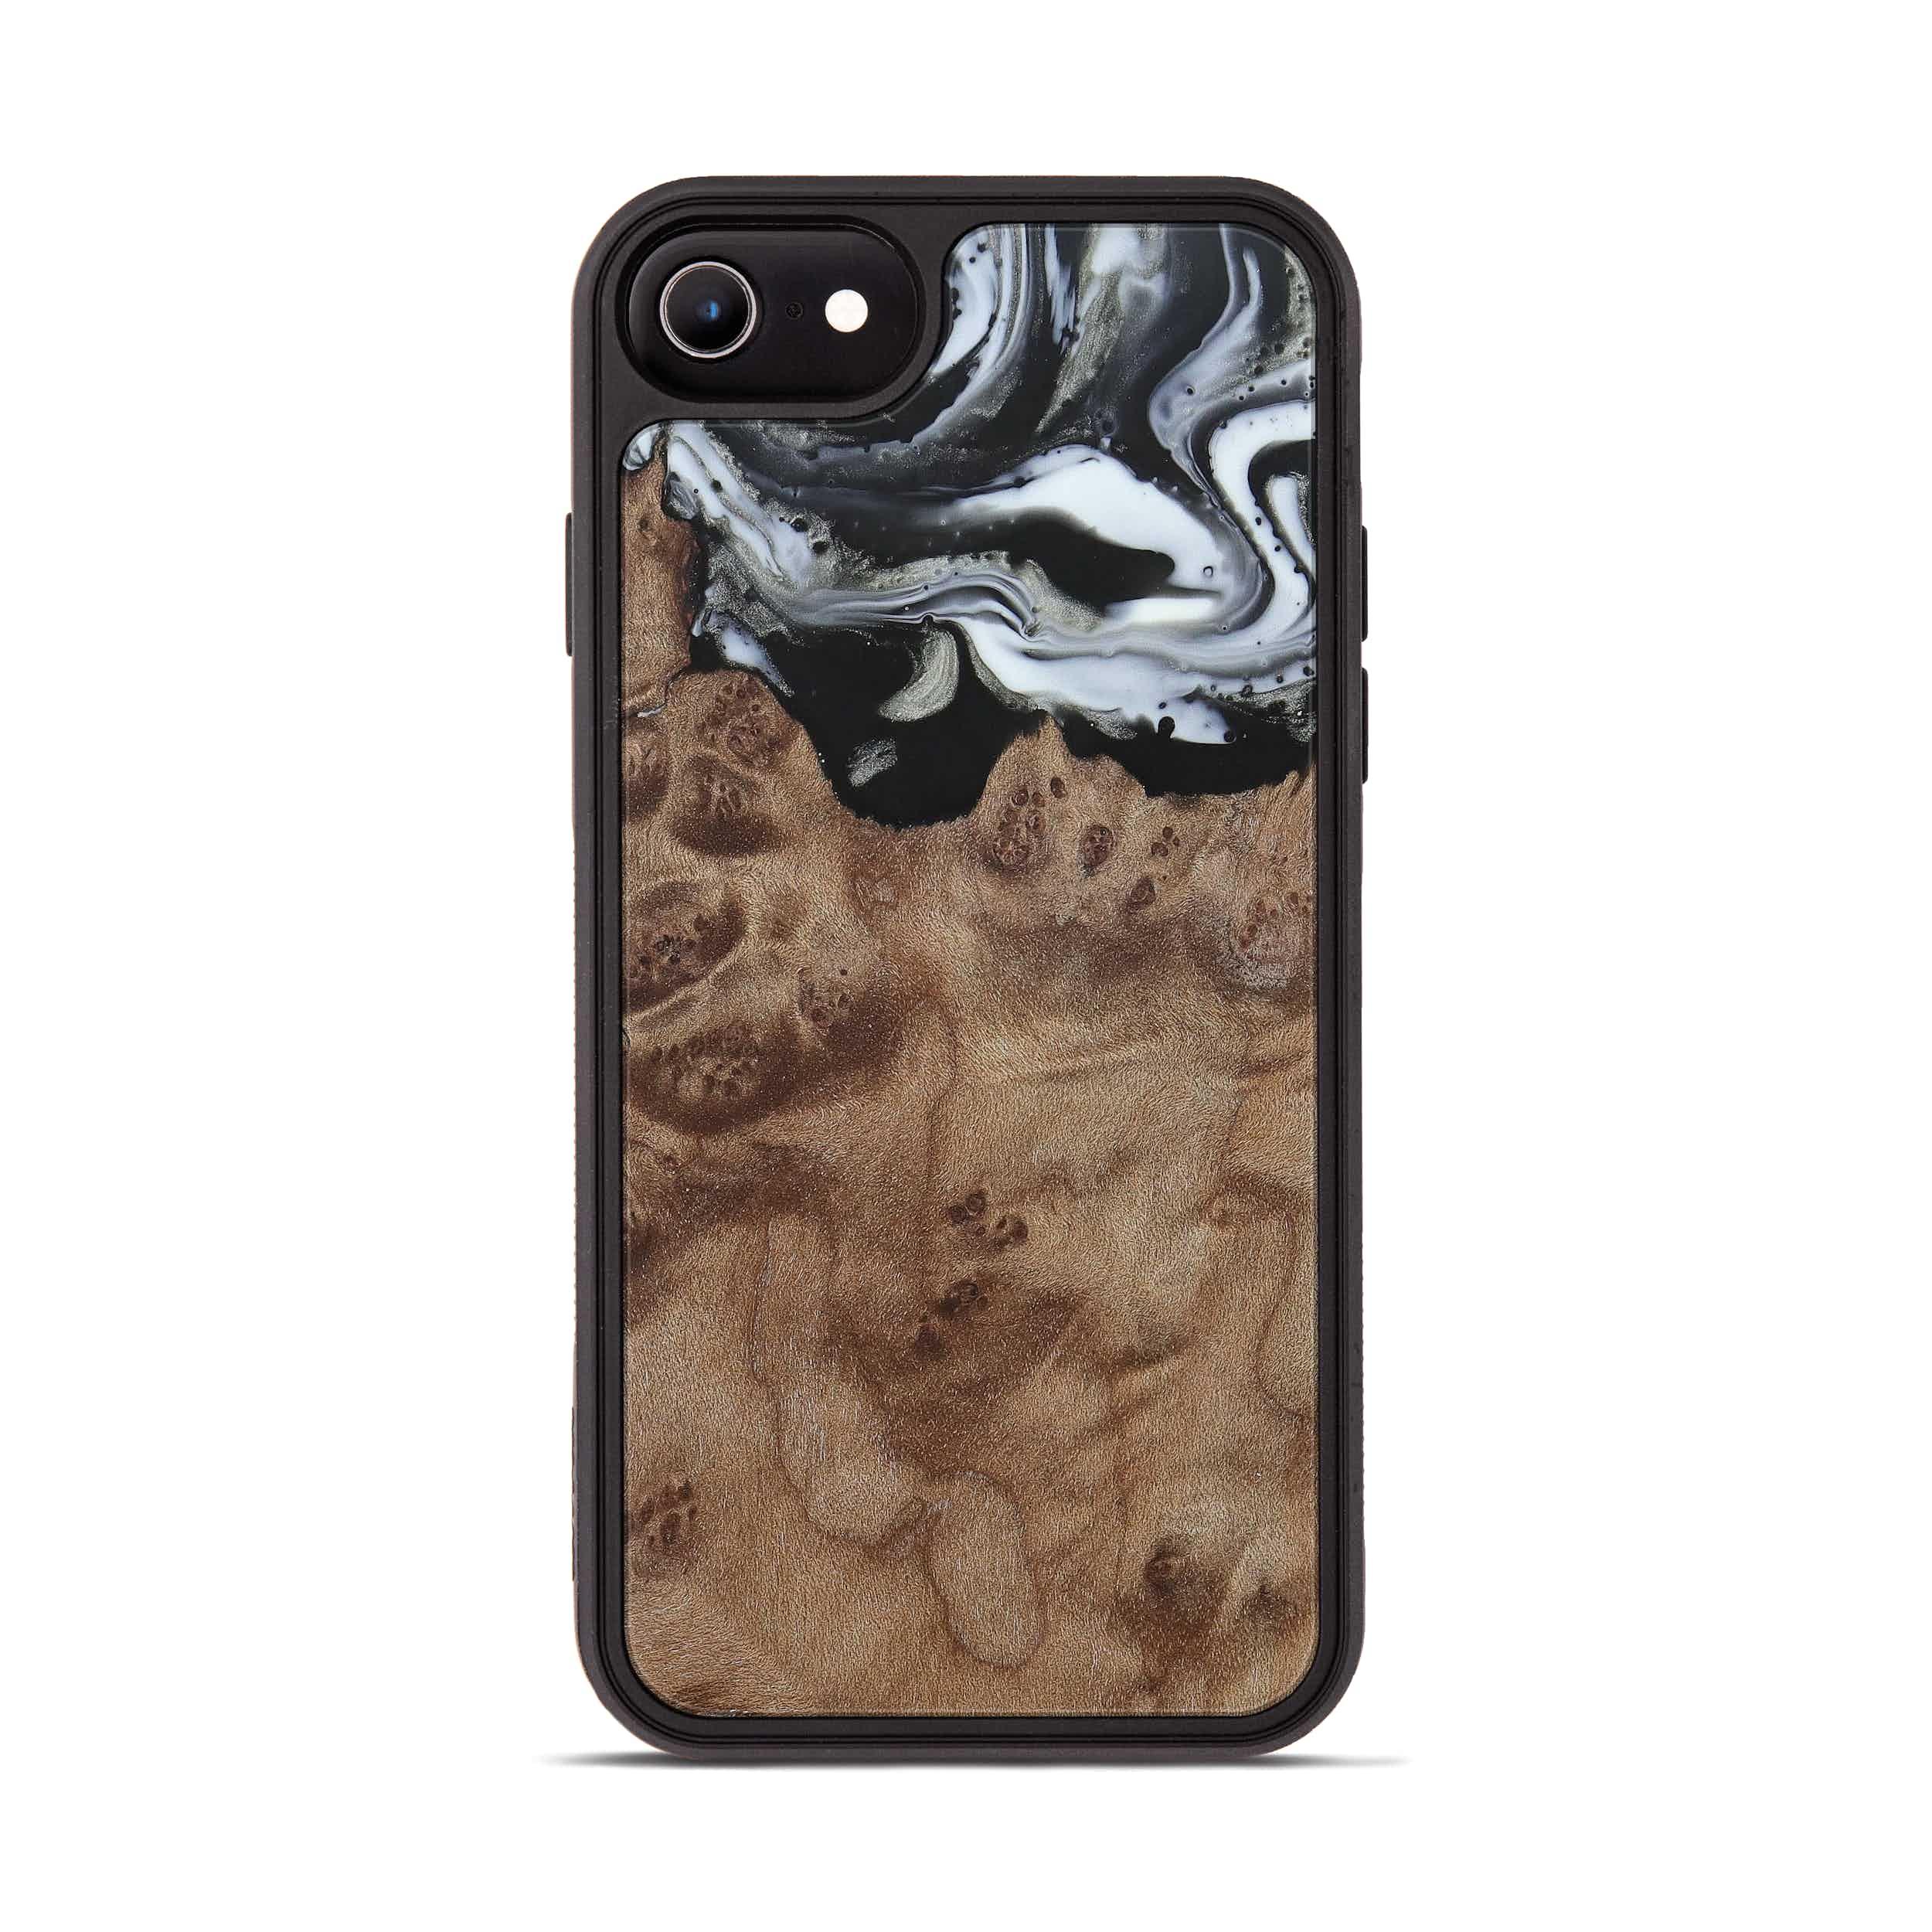 iPhone 8 Wood+Resin Phone Case - Emmey (Black & White, 385906)